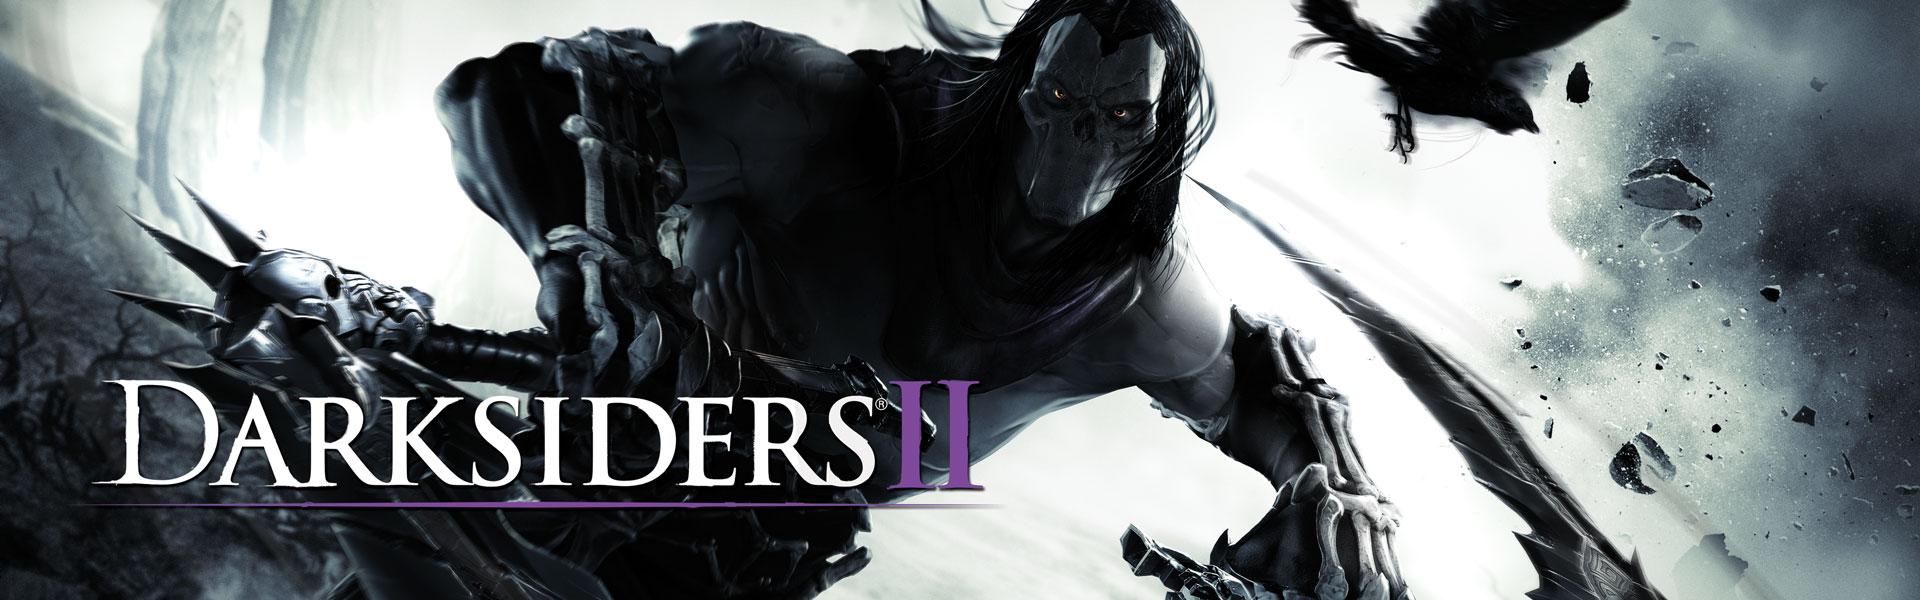 Darksiders 2 | THQ Nordic GmbH